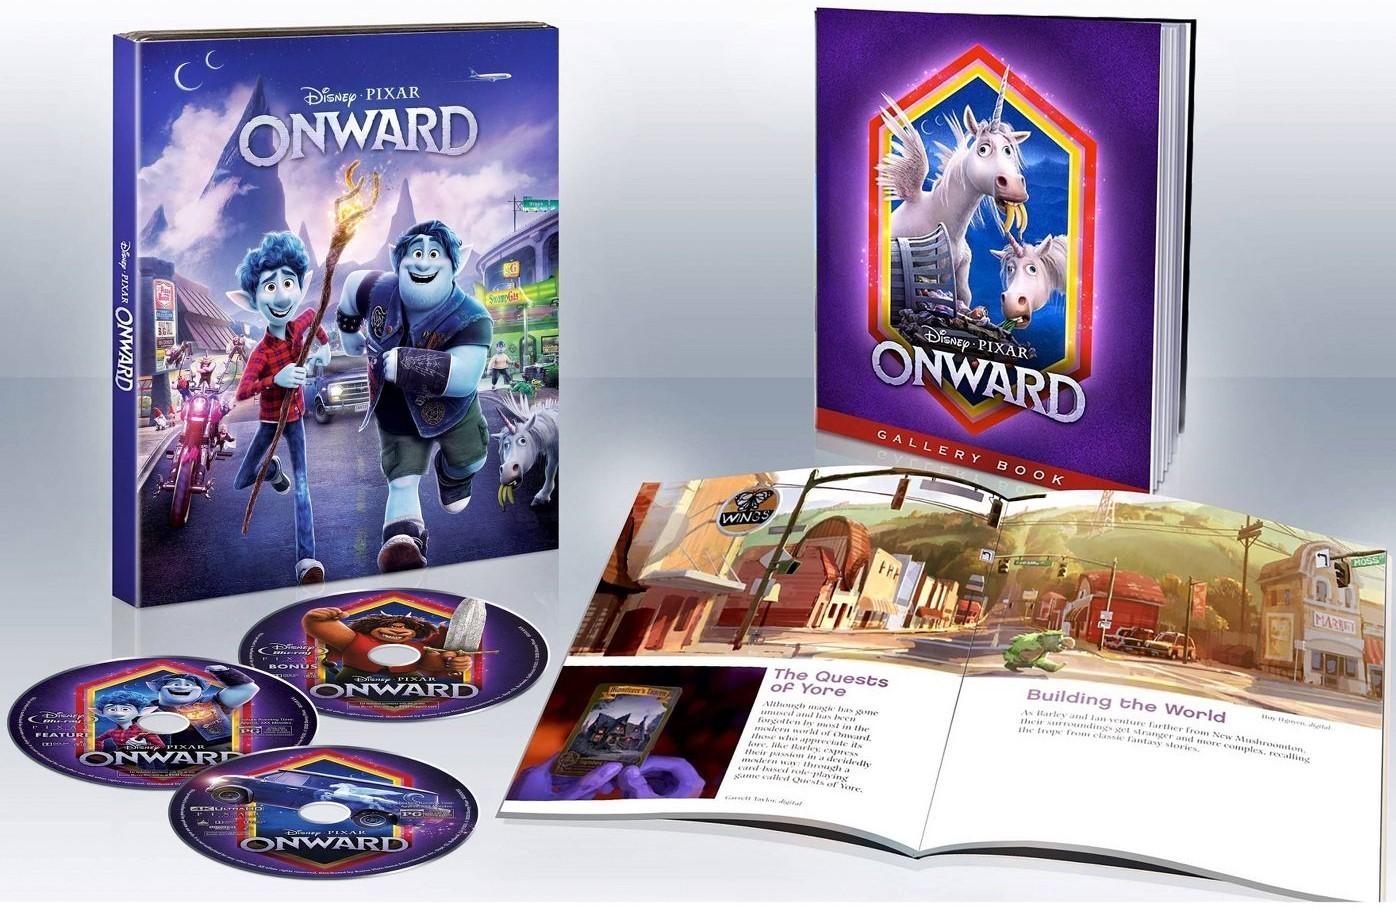 Onward-4K-Ultra-HD and Blu-ray Target Edition book.jpg